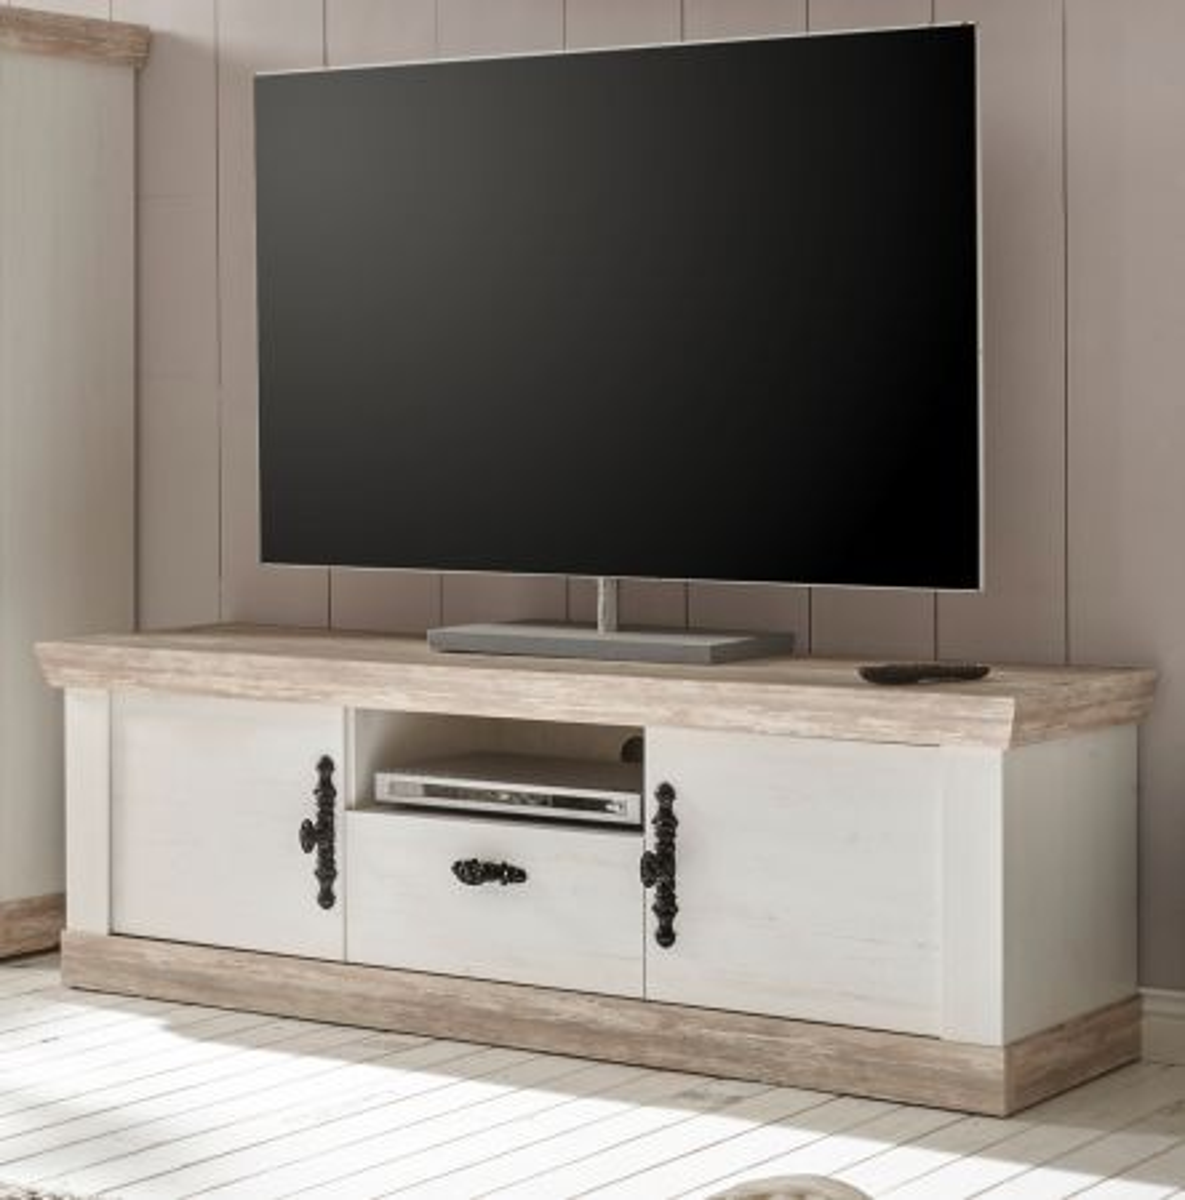 TV-Lowboard Rovola in Pinie weiss Landhaus 156 x 51 cm